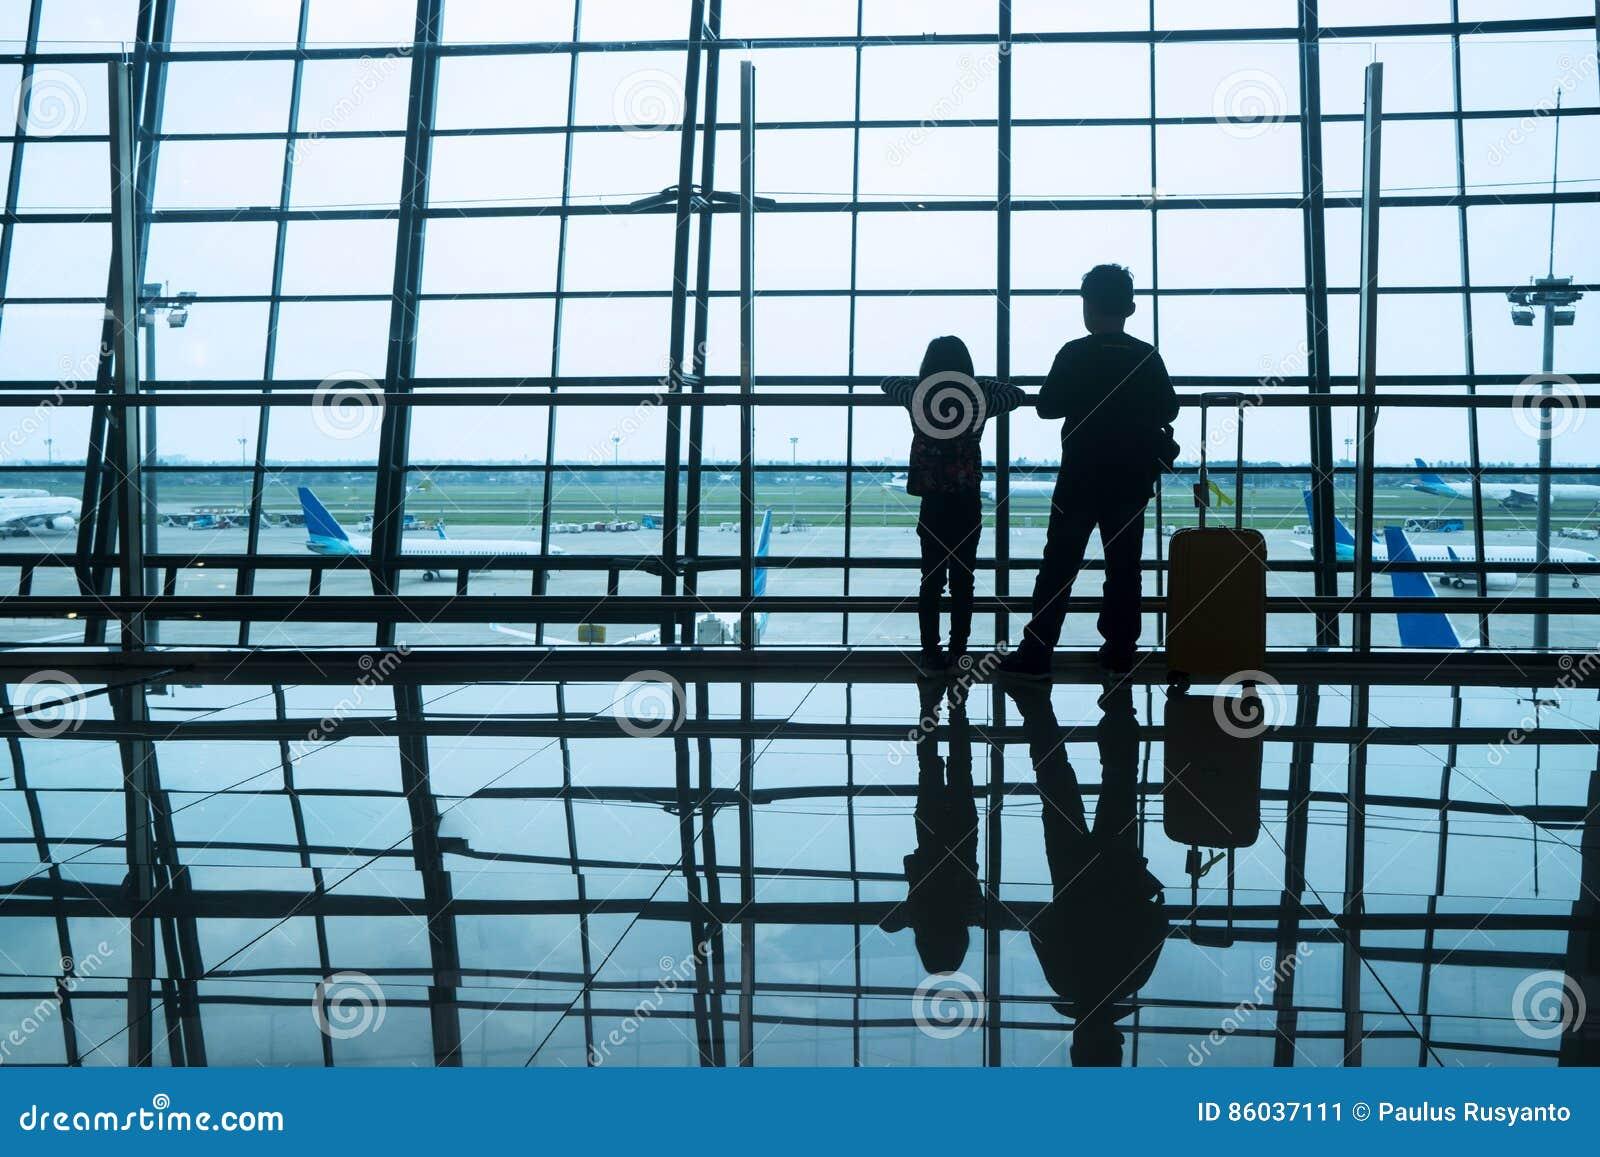 Silhouette children in airport